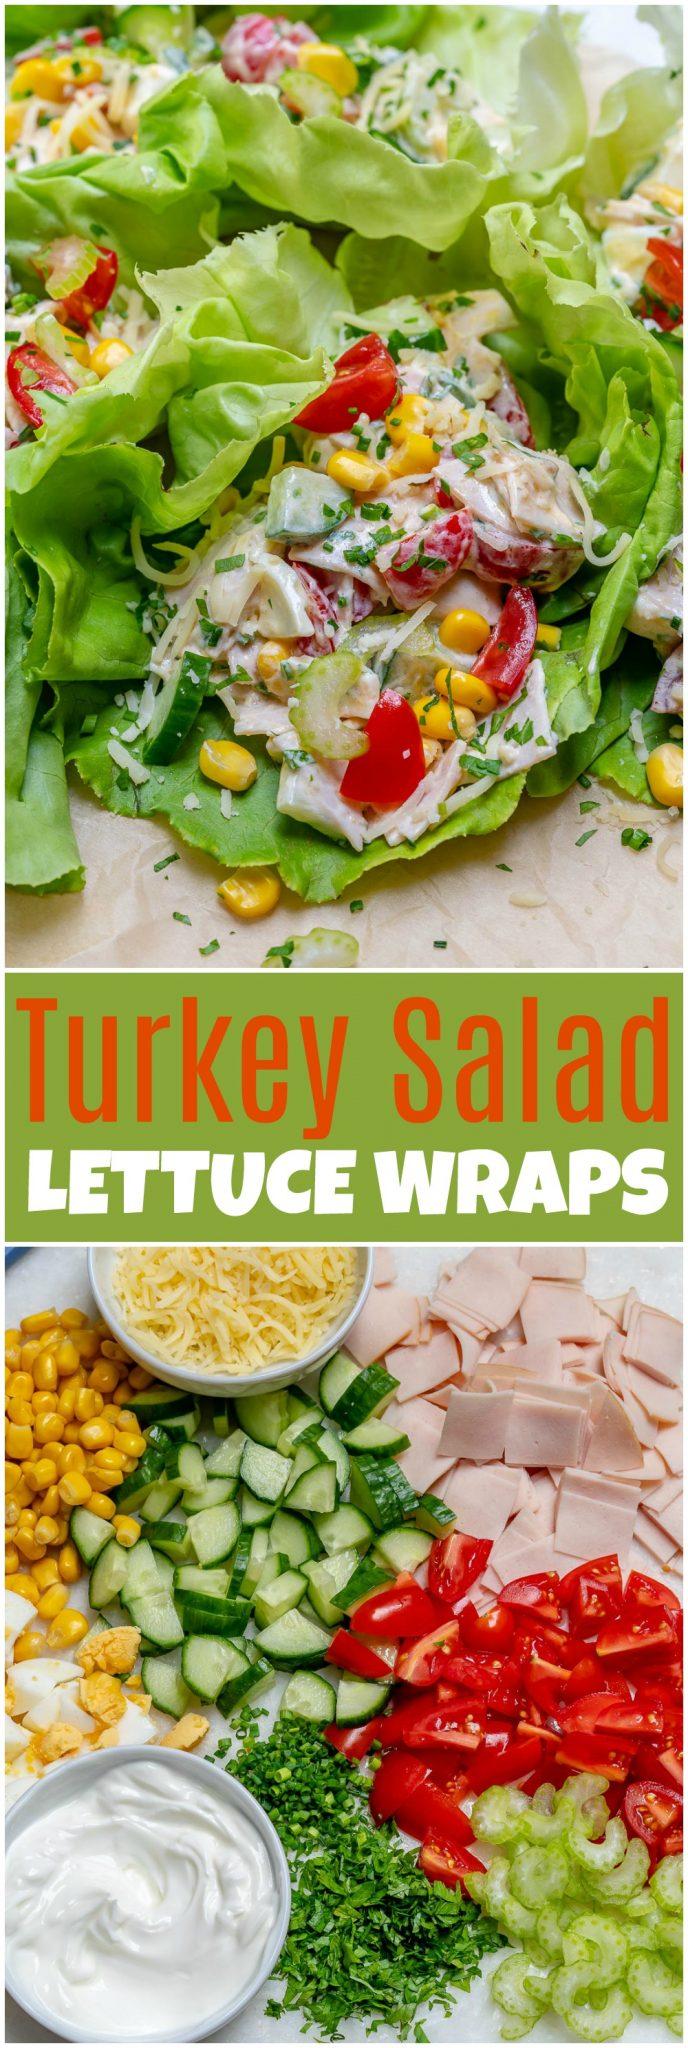 Turkey Salad Easy Healthy Dinner Recipes